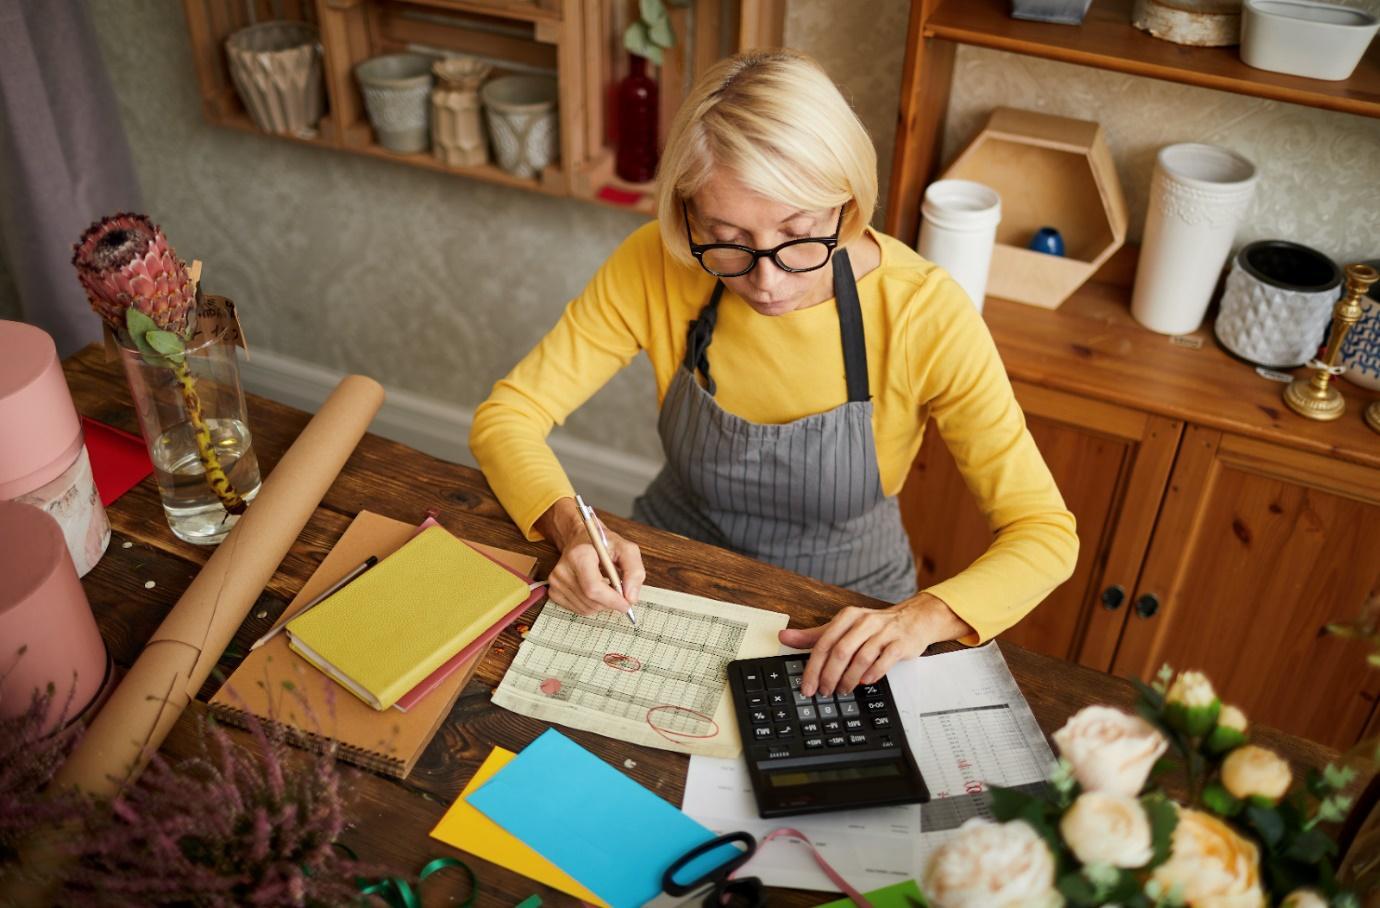 Female entrepreneur working in her home